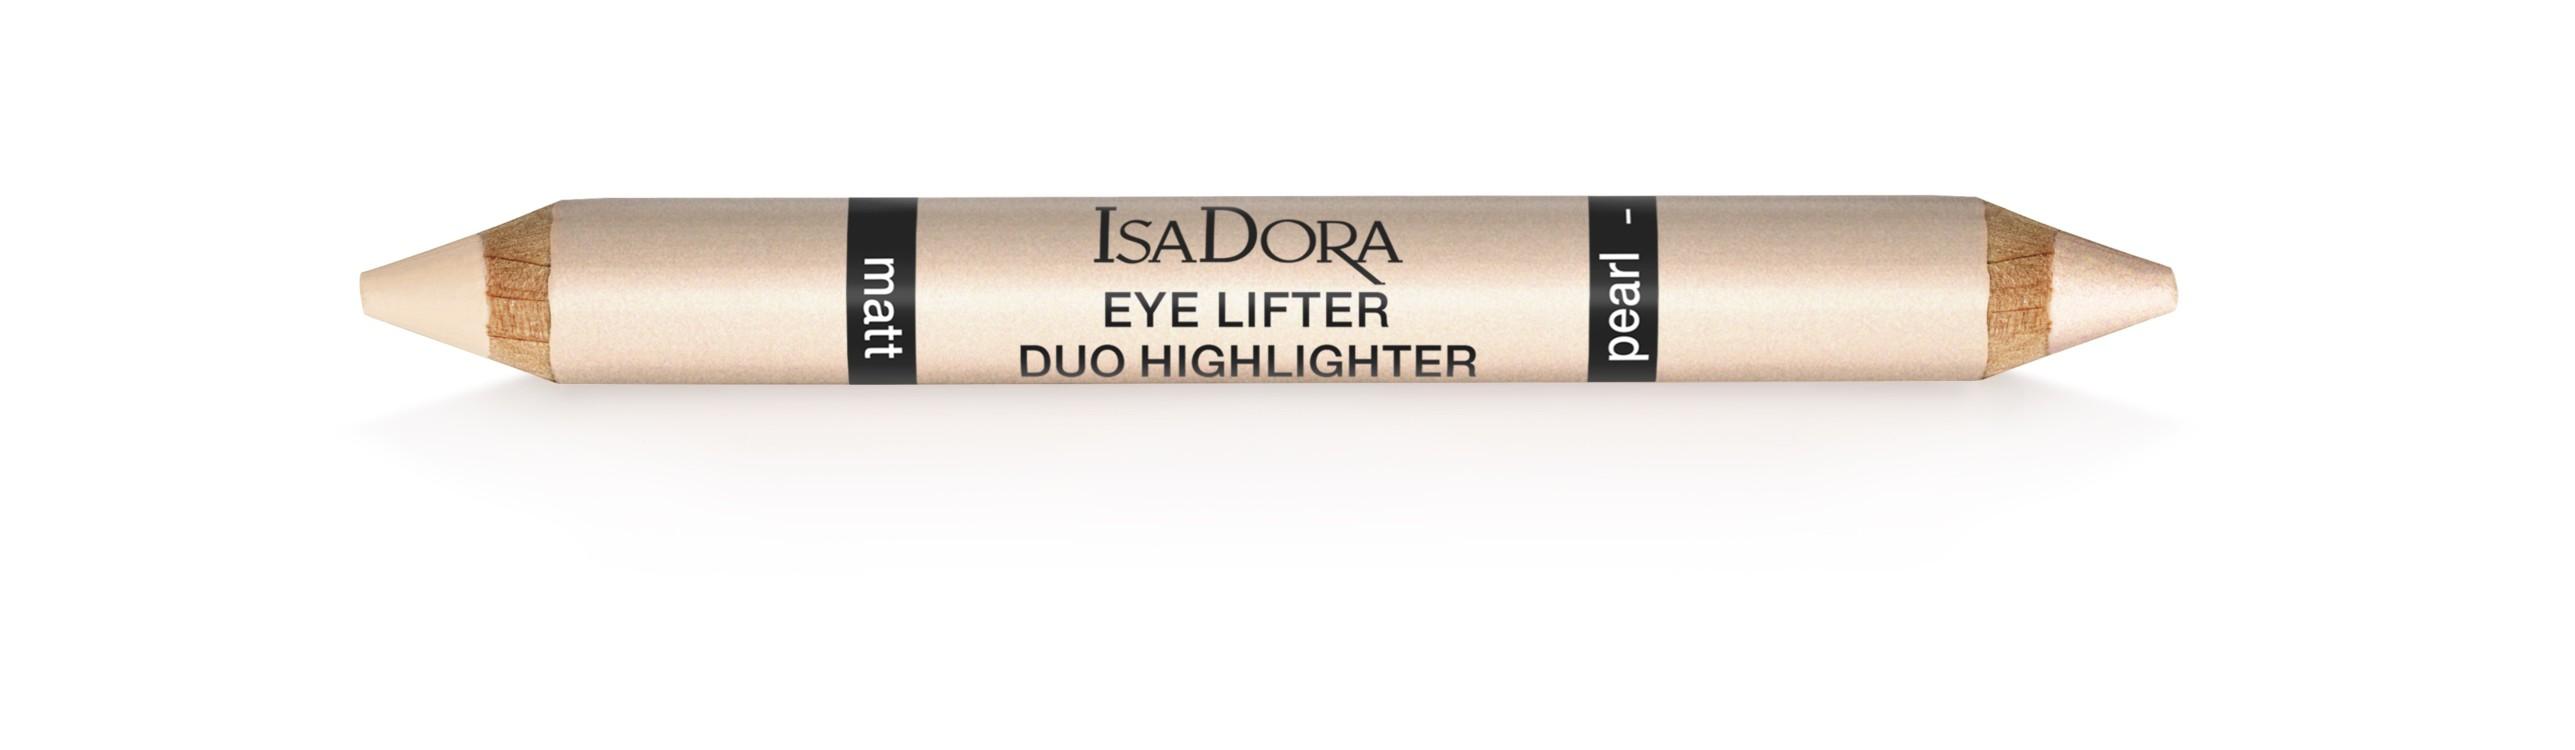 Карандаш-хайлайтер Eye Lifter Duo 3-in-1 для макияжа глаз, IsaDora